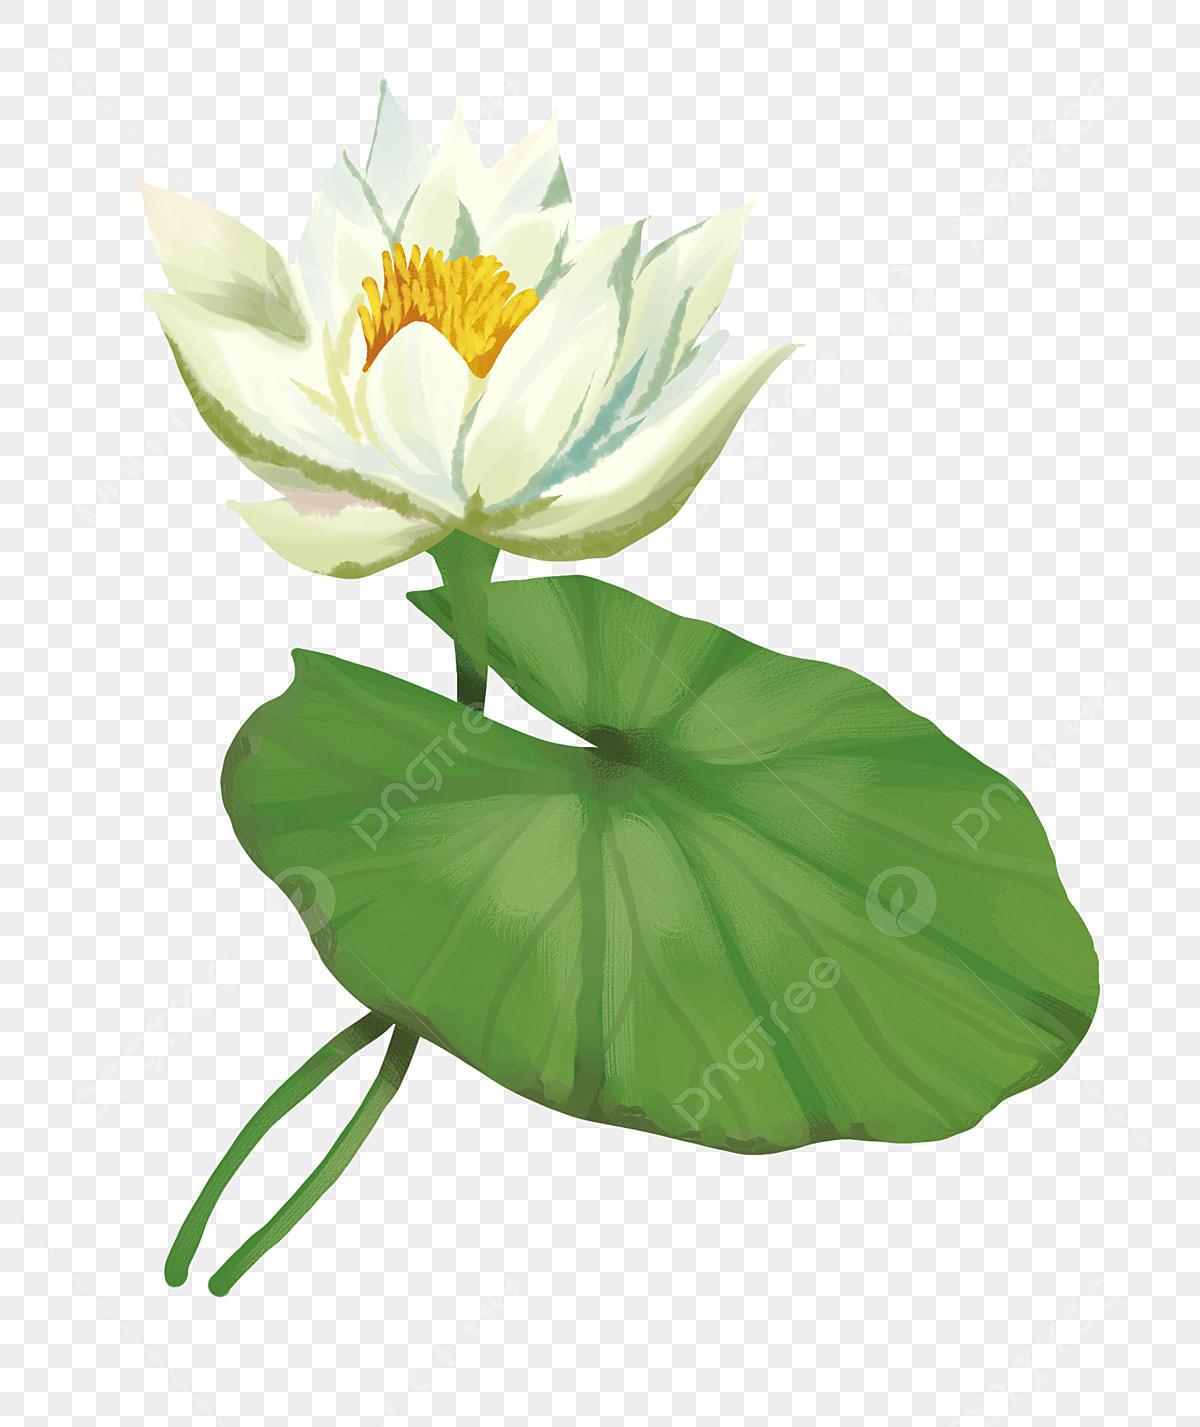 Lotus Blanc Illustration De Dessin Animé Illustration De